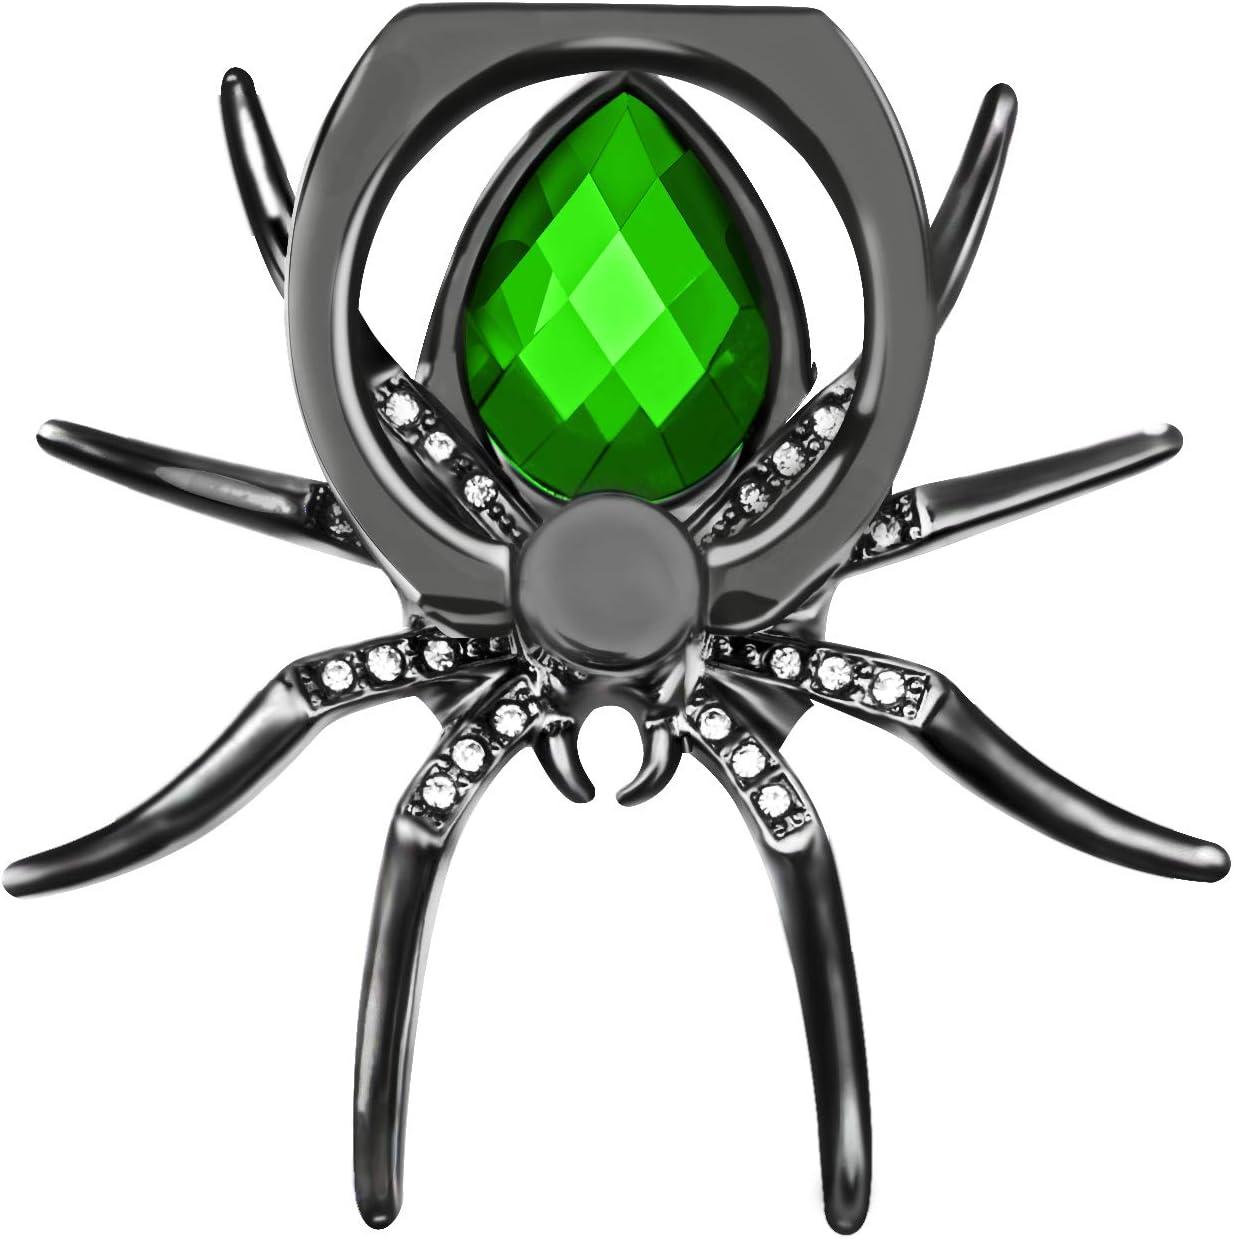 IYOYI Frio Araña Anillo Soporte Movil Rotación 360 Grados Diamantes Sujeta Movil Mano per Todos los teléfonos celulares (Verde)